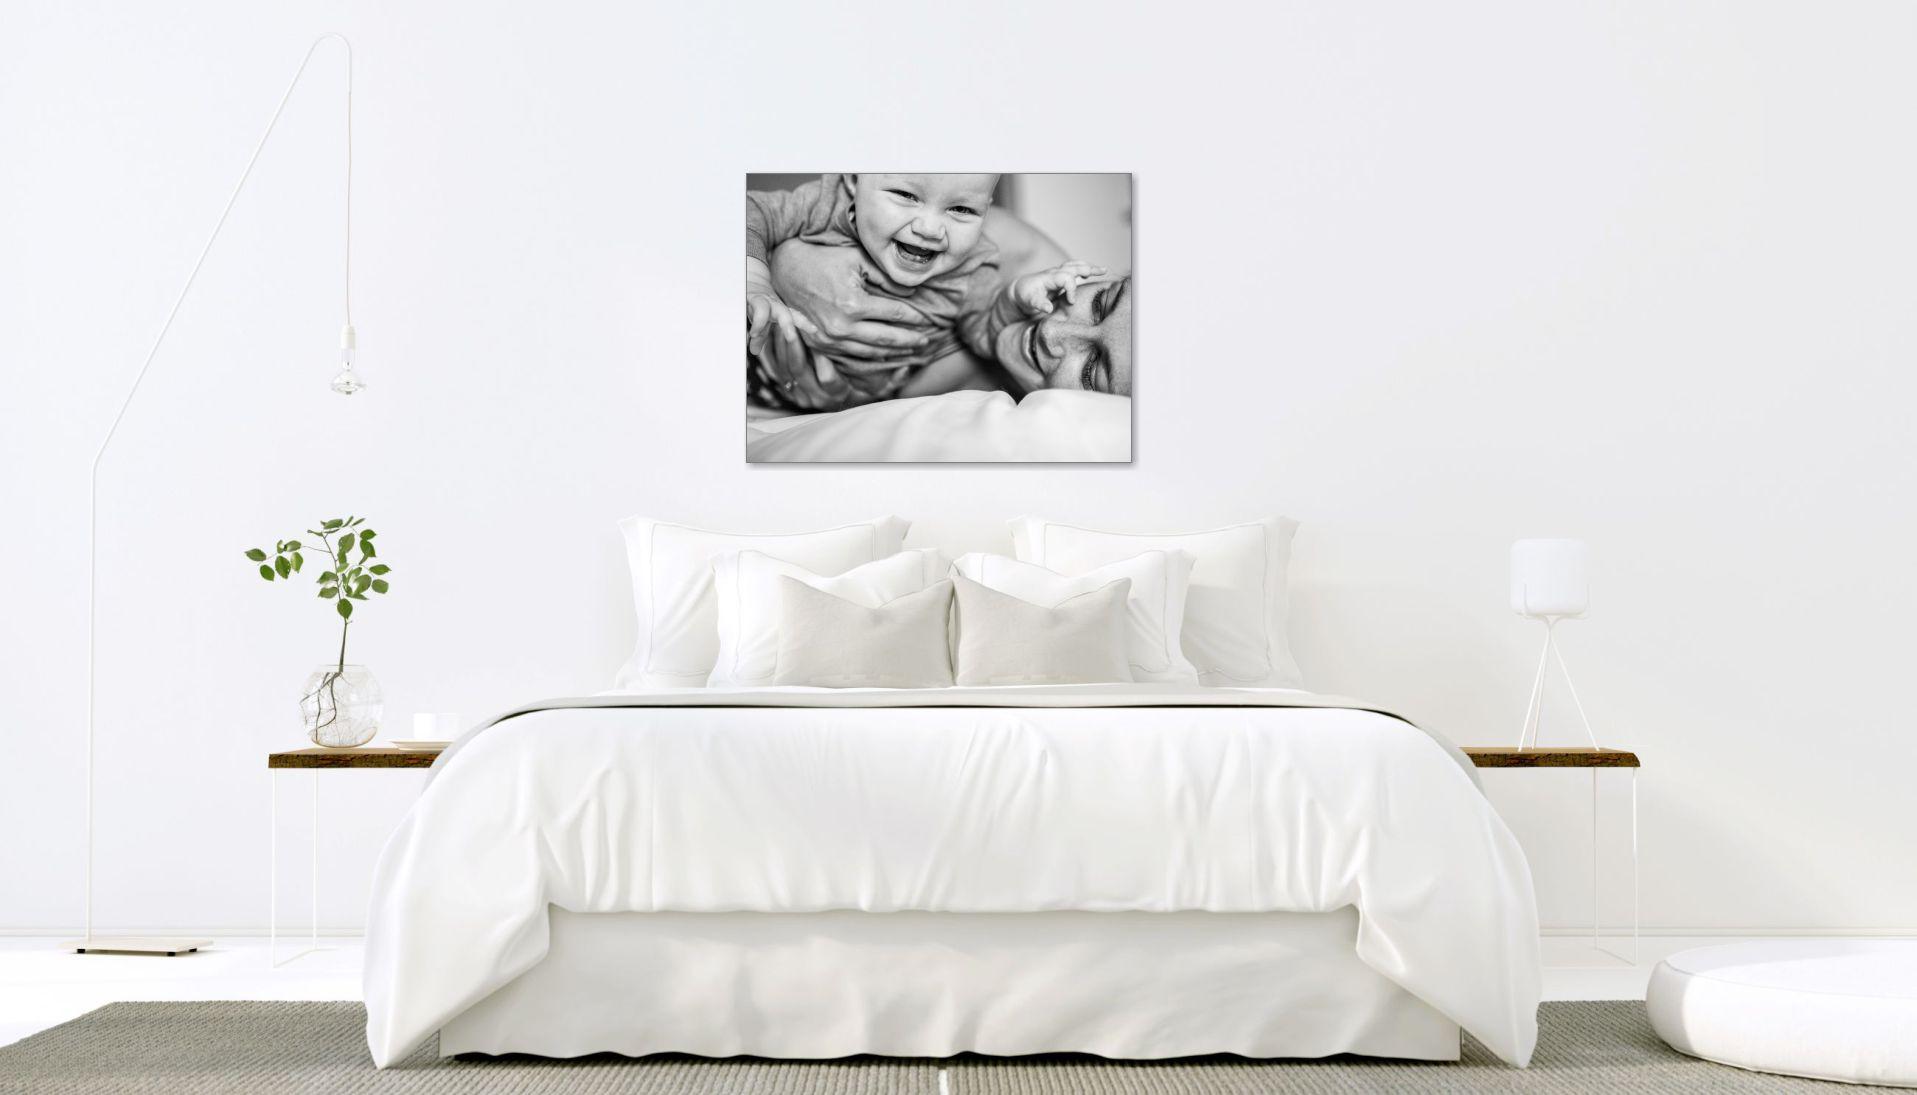 White King Bed 2 copy.jpg